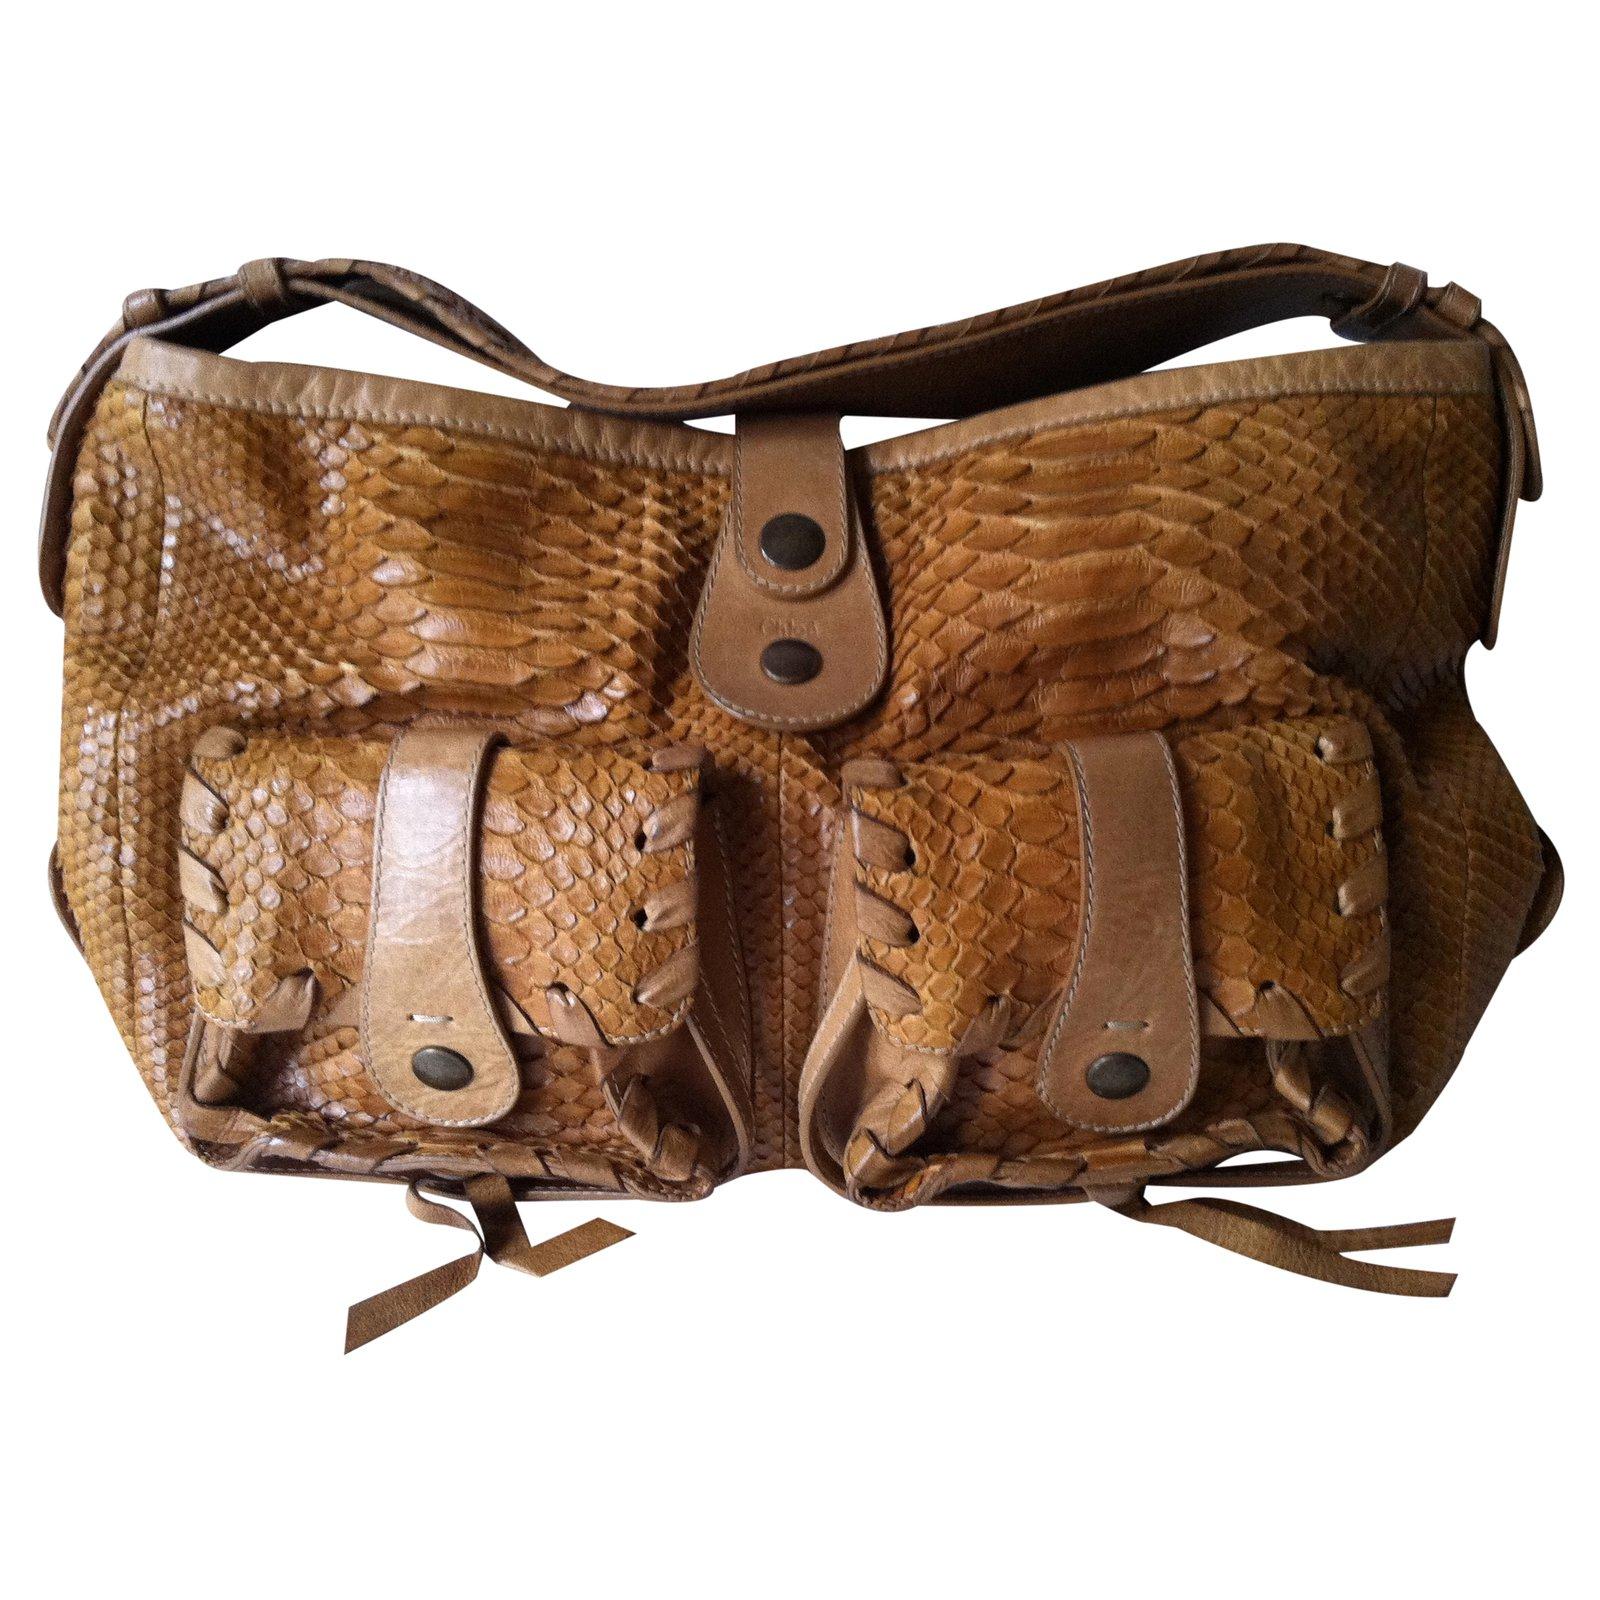 sacs main chlo chlo sac silverado en python couleur marron claire cuirs exotiques marron. Black Bedroom Furniture Sets. Home Design Ideas